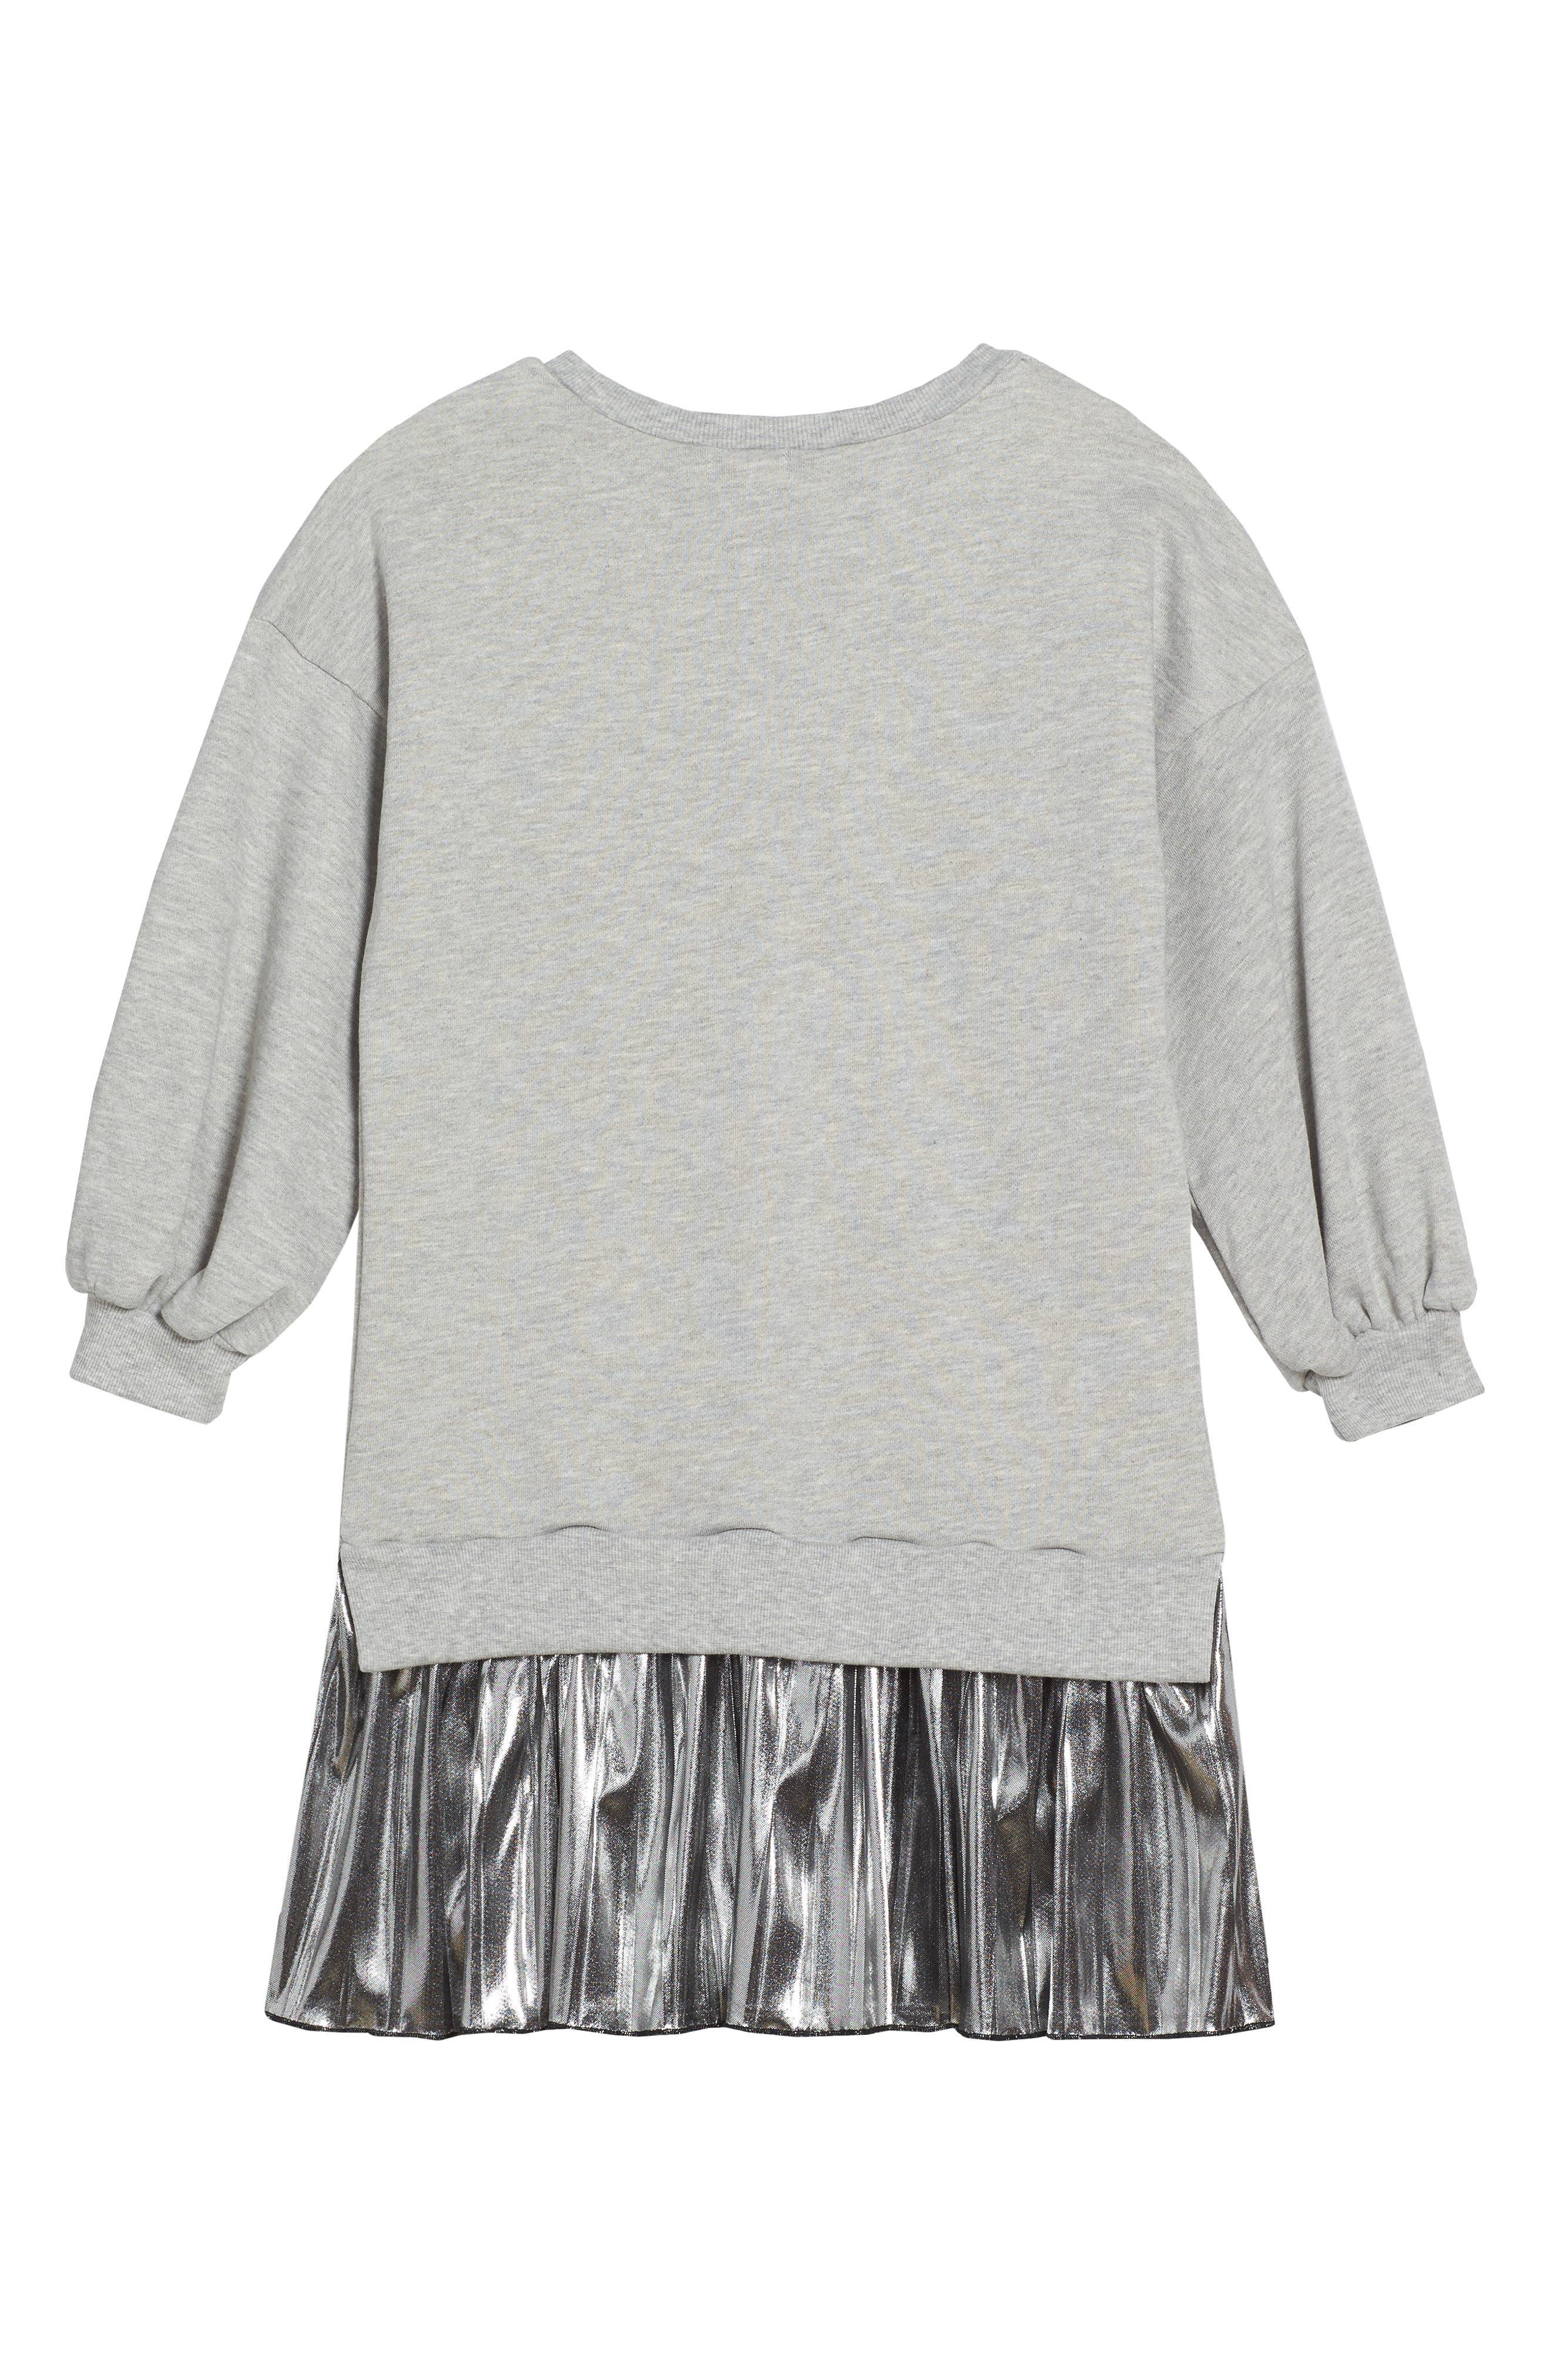 Metallic Sweatshirt Dress,                             Alternate thumbnail 2, color,                             020